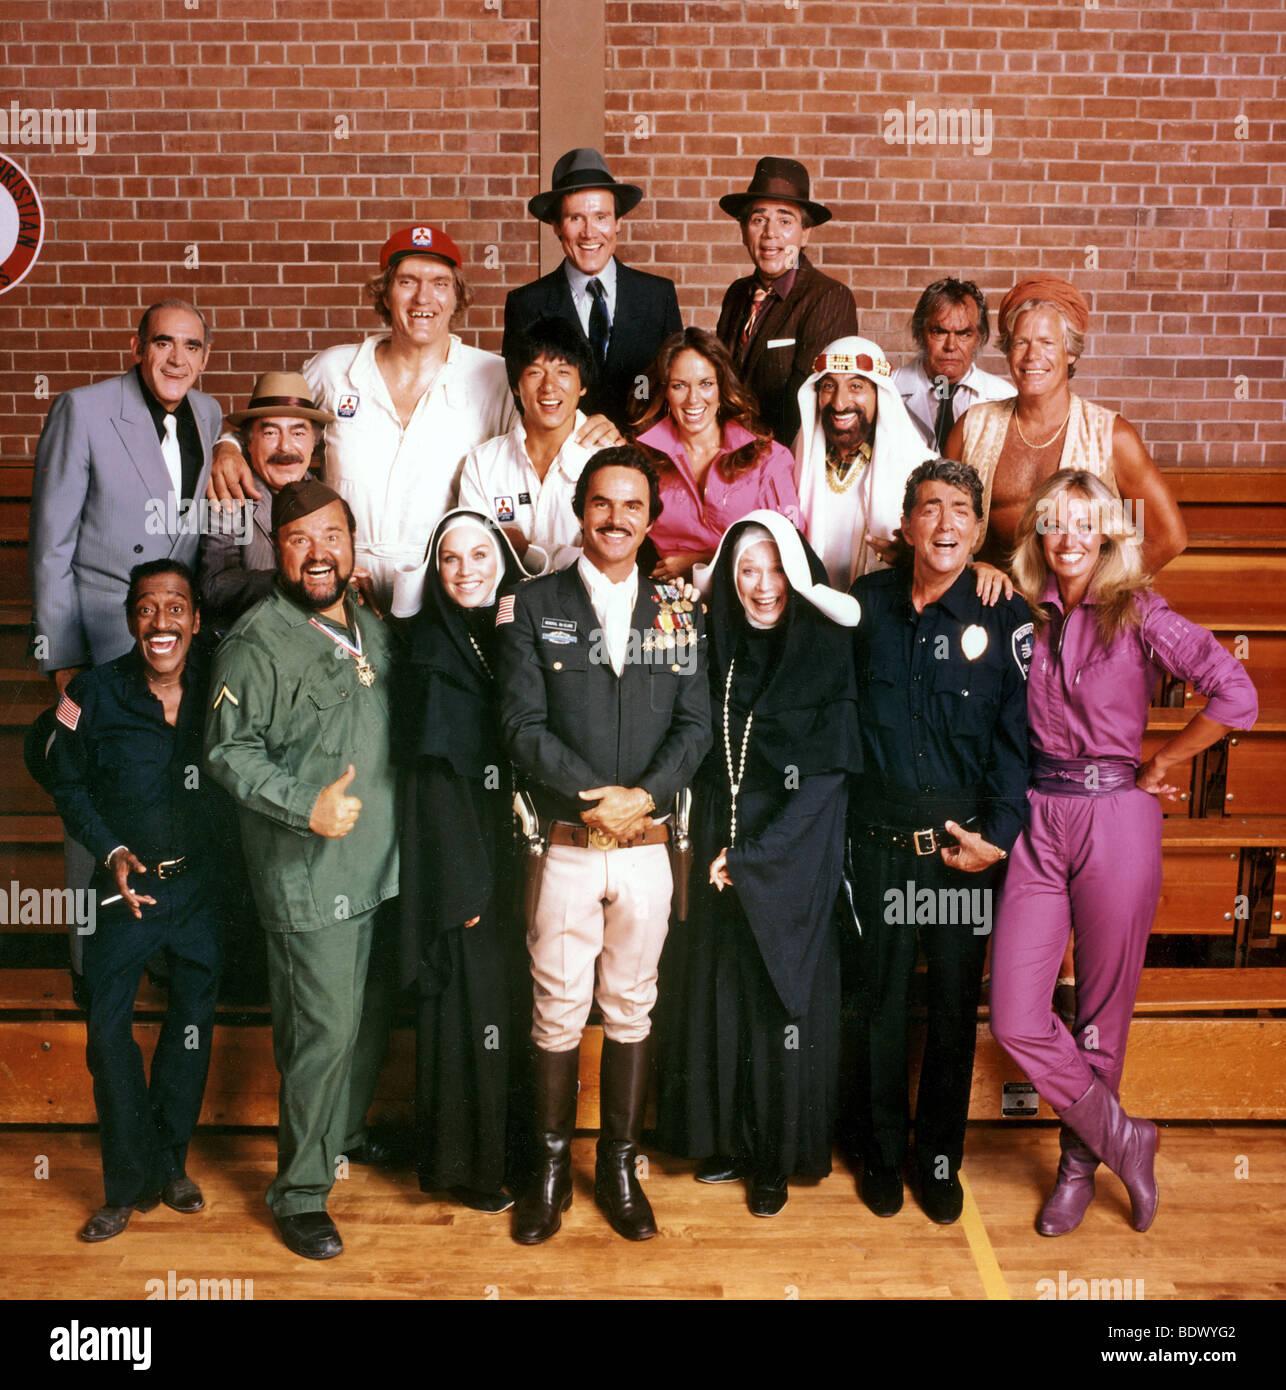 THE CANNONBALL RUN - 1980 Golden Harvest film with Sammy Davis Jnr, Burt Reynolds,  Dean Martin Farrah Fawcett - Stock Image